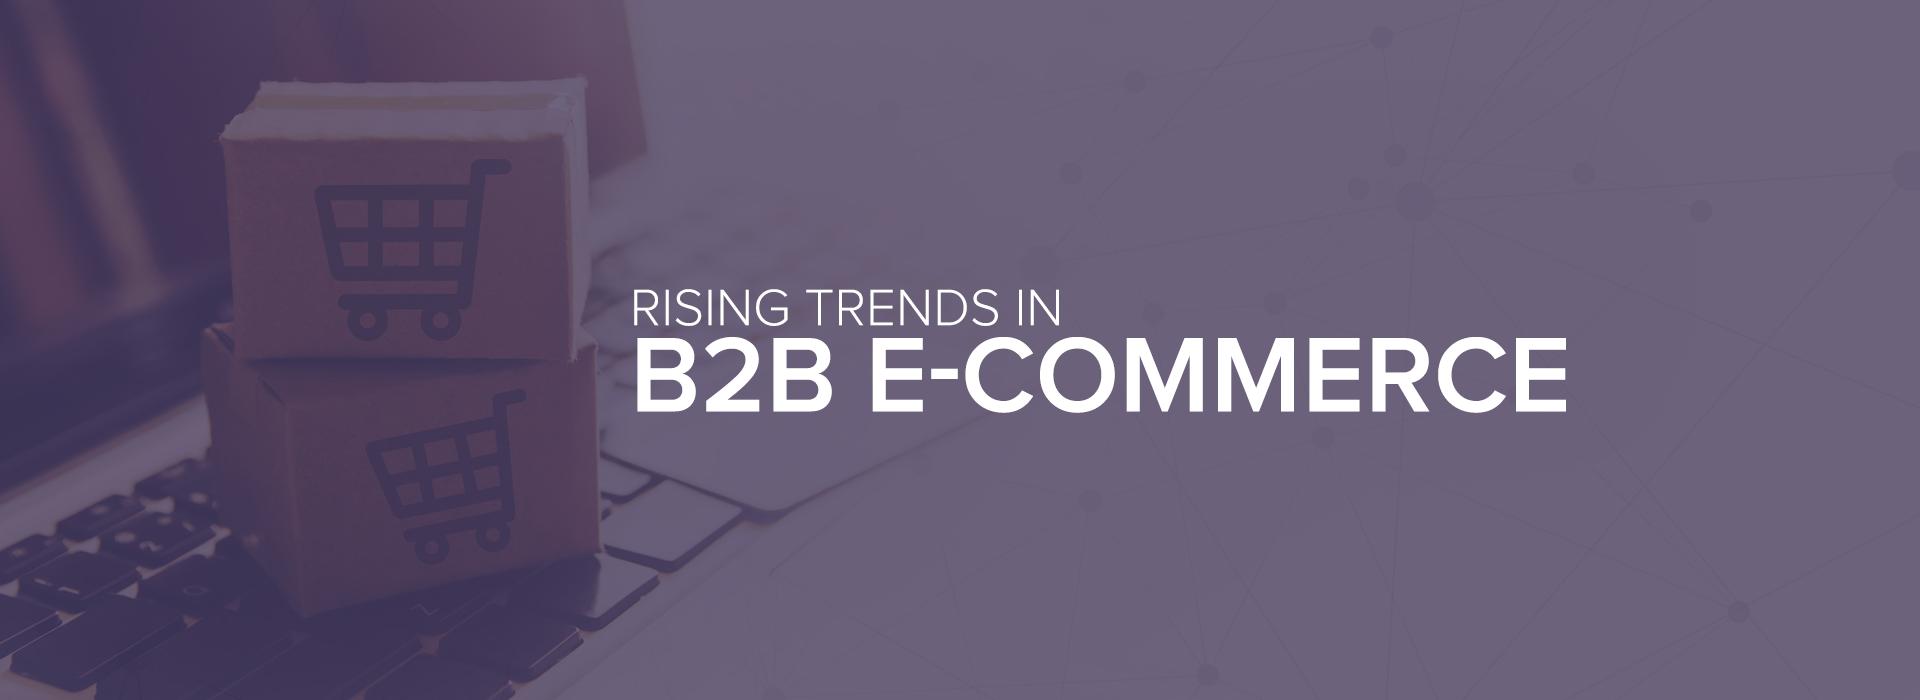 Rising-Trends-in-B2B-E-commerce